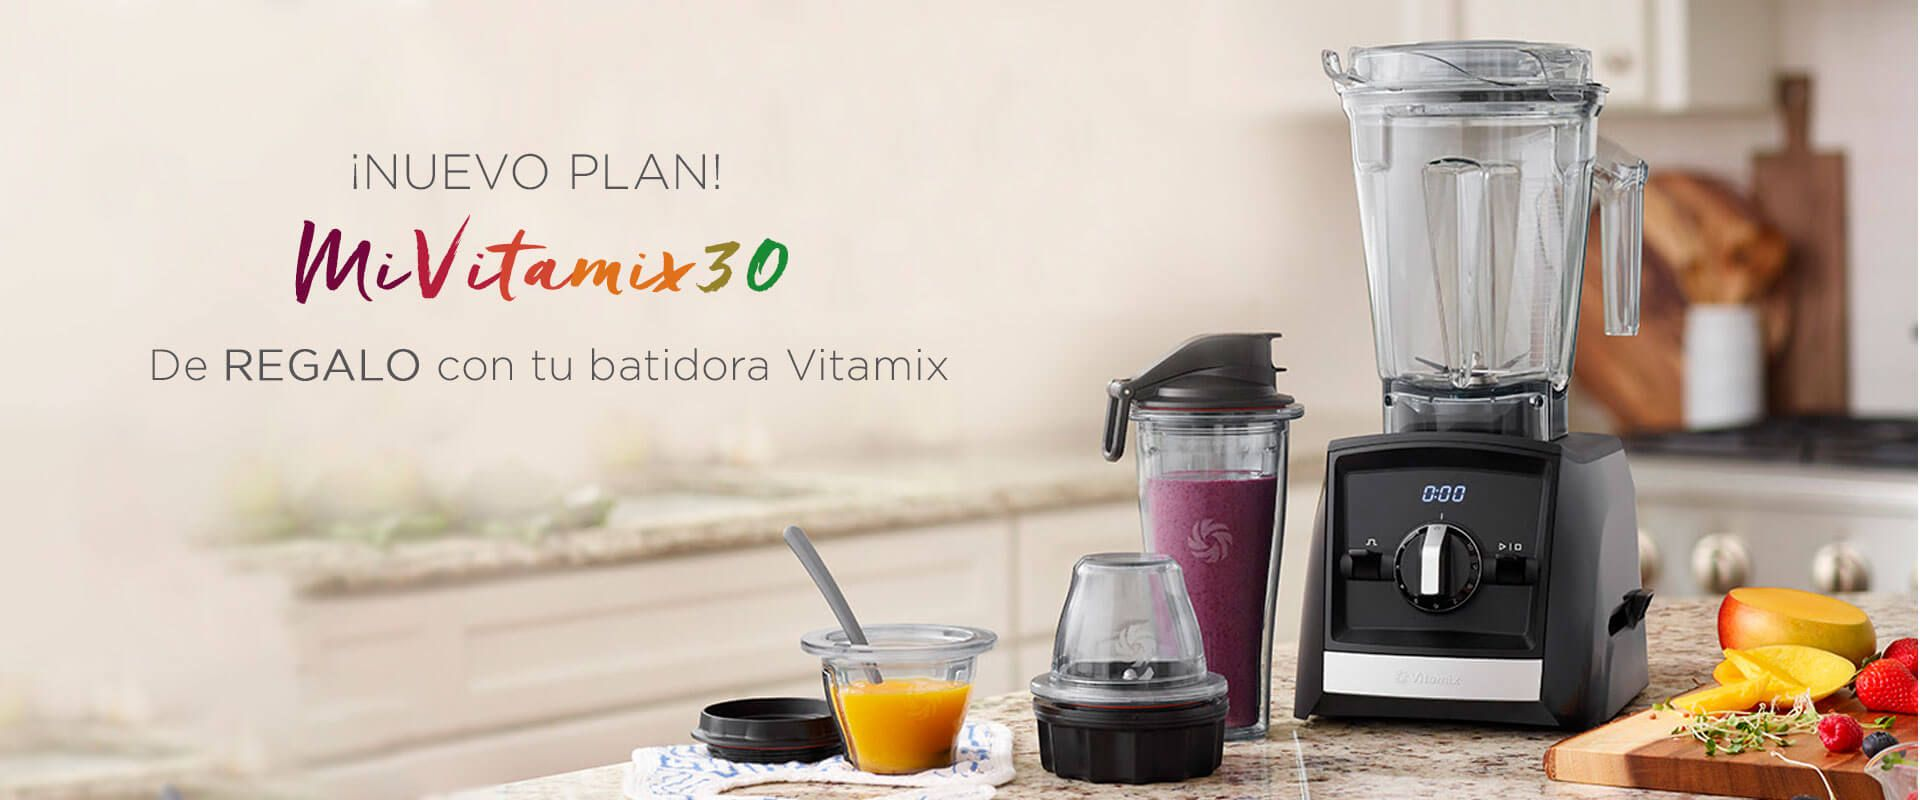 Batidora de vaso Vitamix